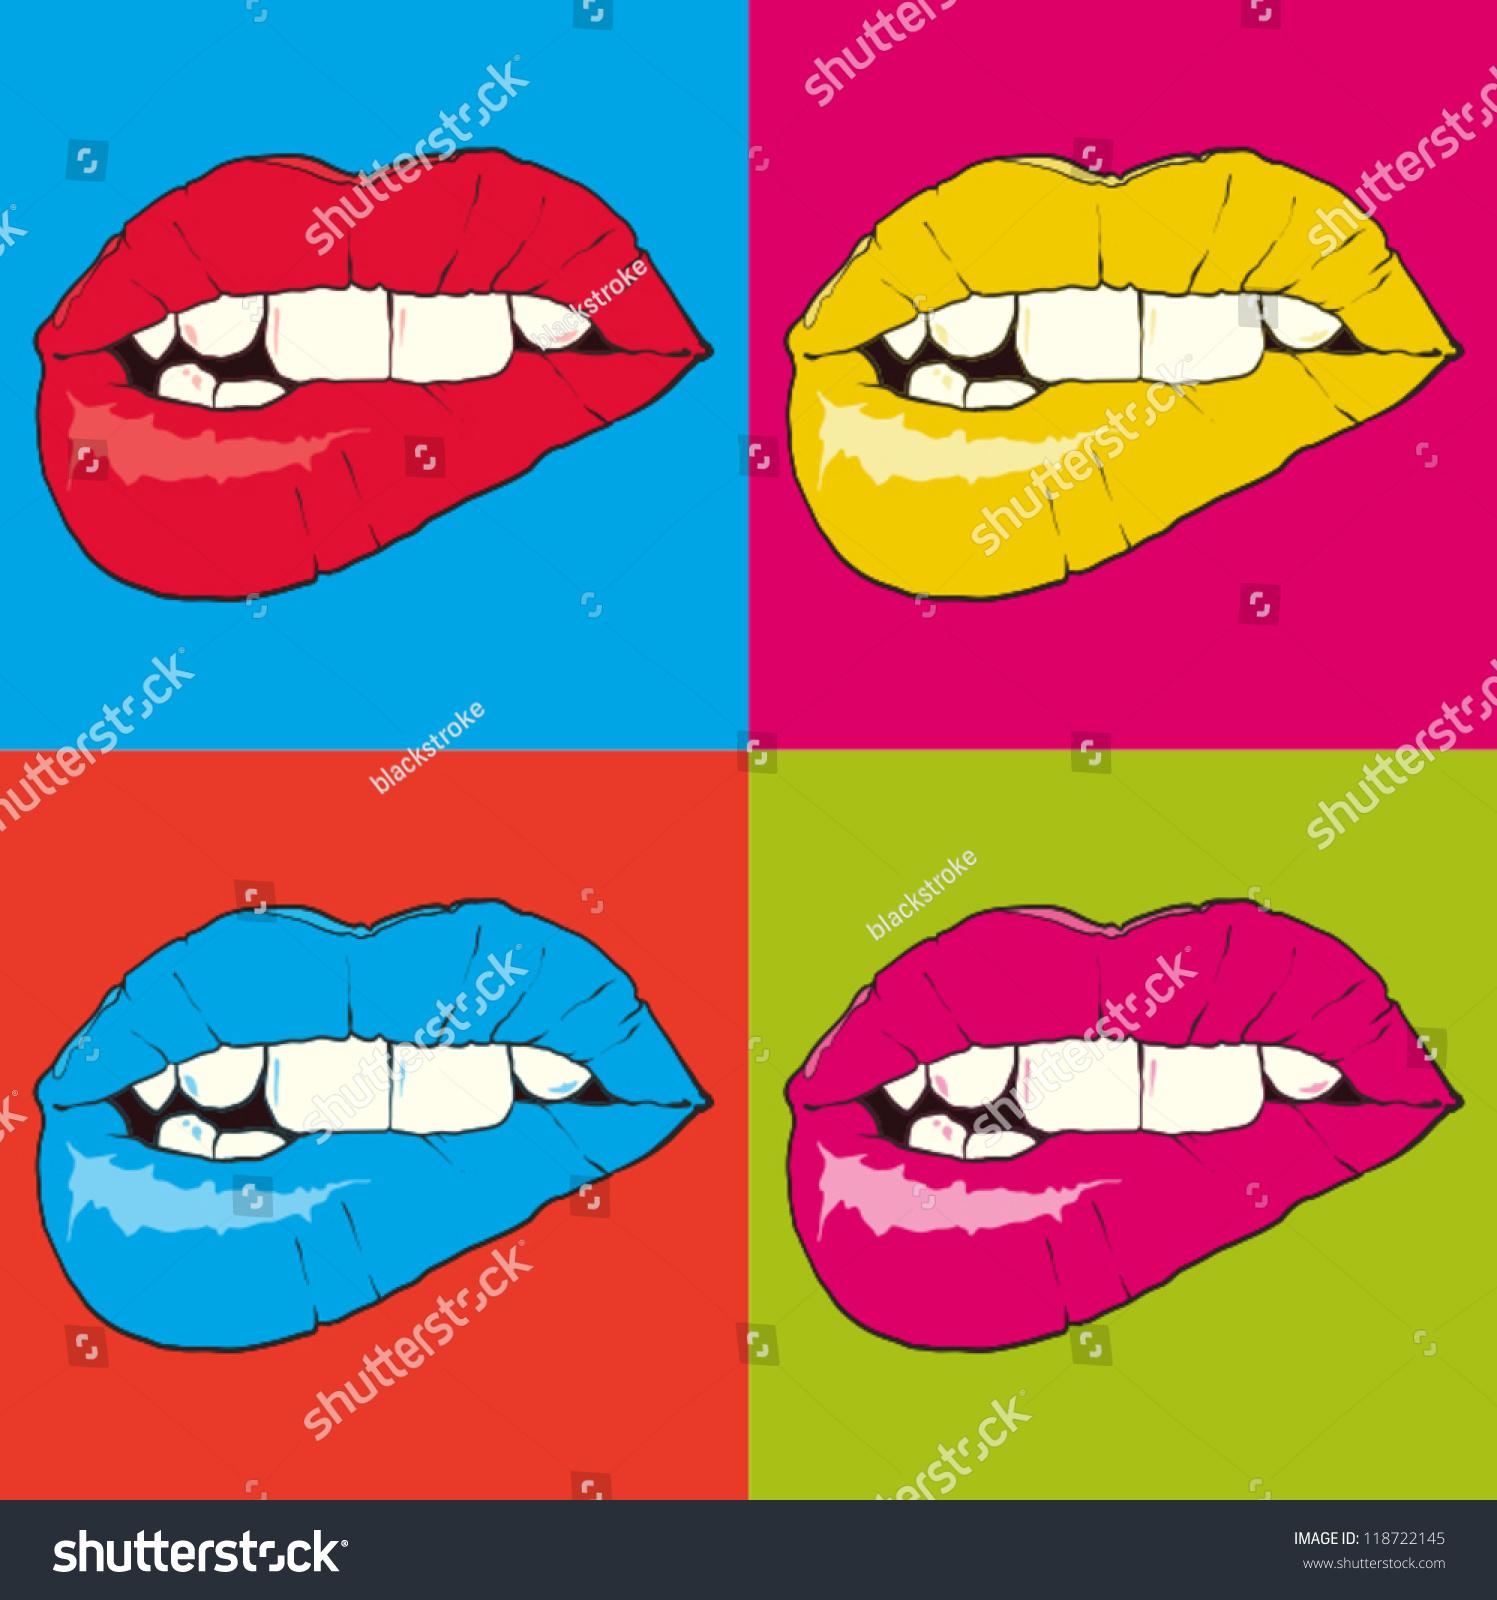 popart lips stock vector 118722145 shutterstock. Black Bedroom Furniture Sets. Home Design Ideas